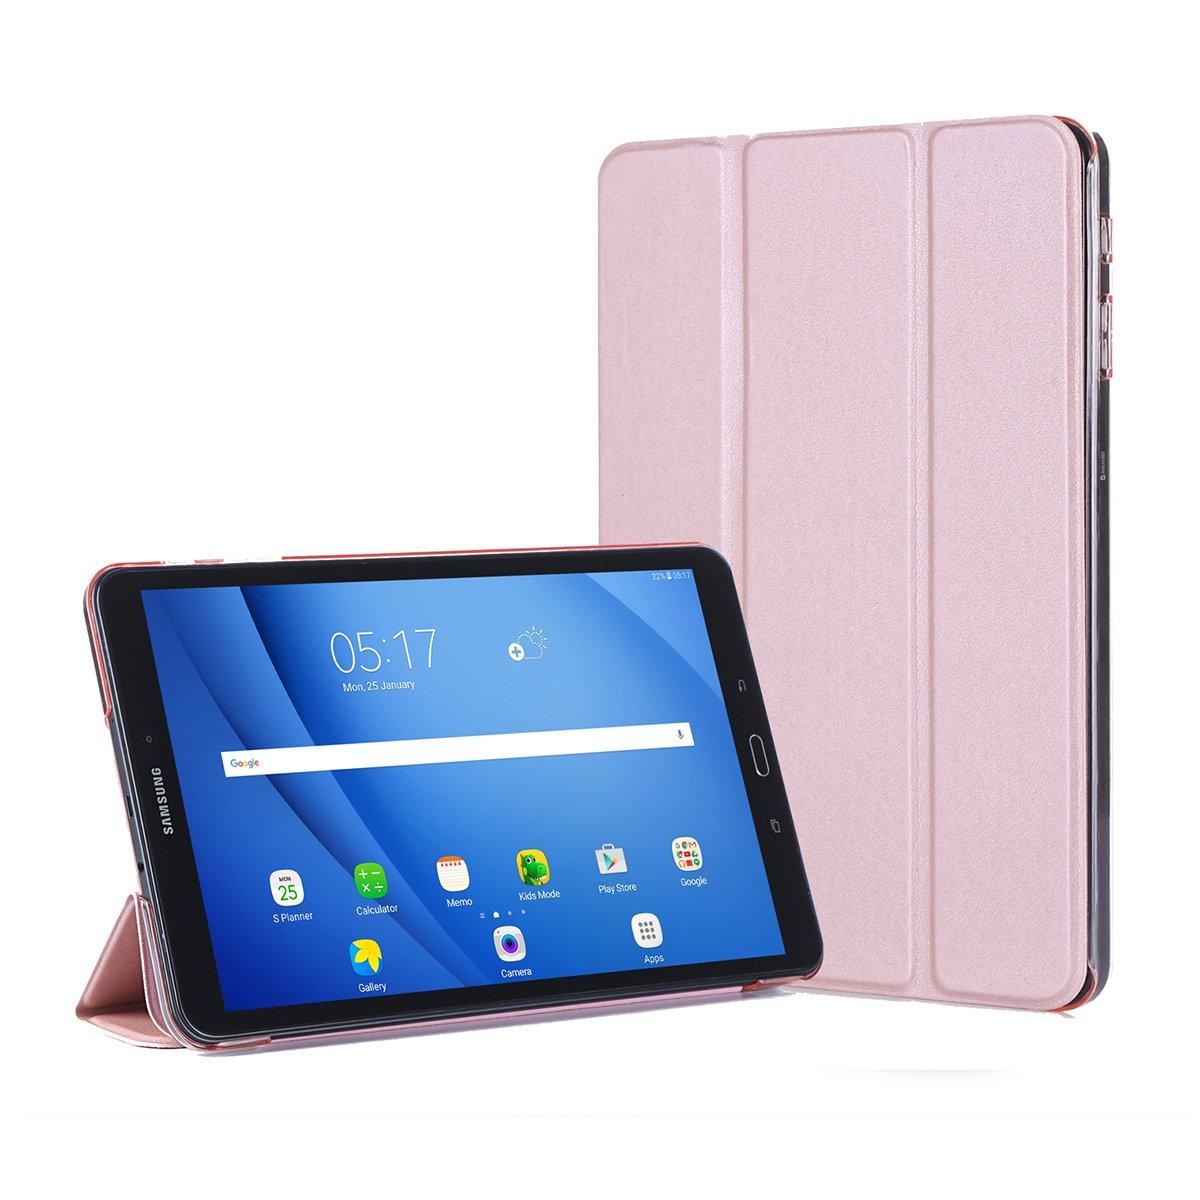 Samsung Galaxy Tab A 10.1 SM-T580 Women PU Leather Wallet Case Flip  Kickstand Function Ultra Folio Flip Slim Card Holder Case Cover Leather Case  Samsung ... c743f9ce19